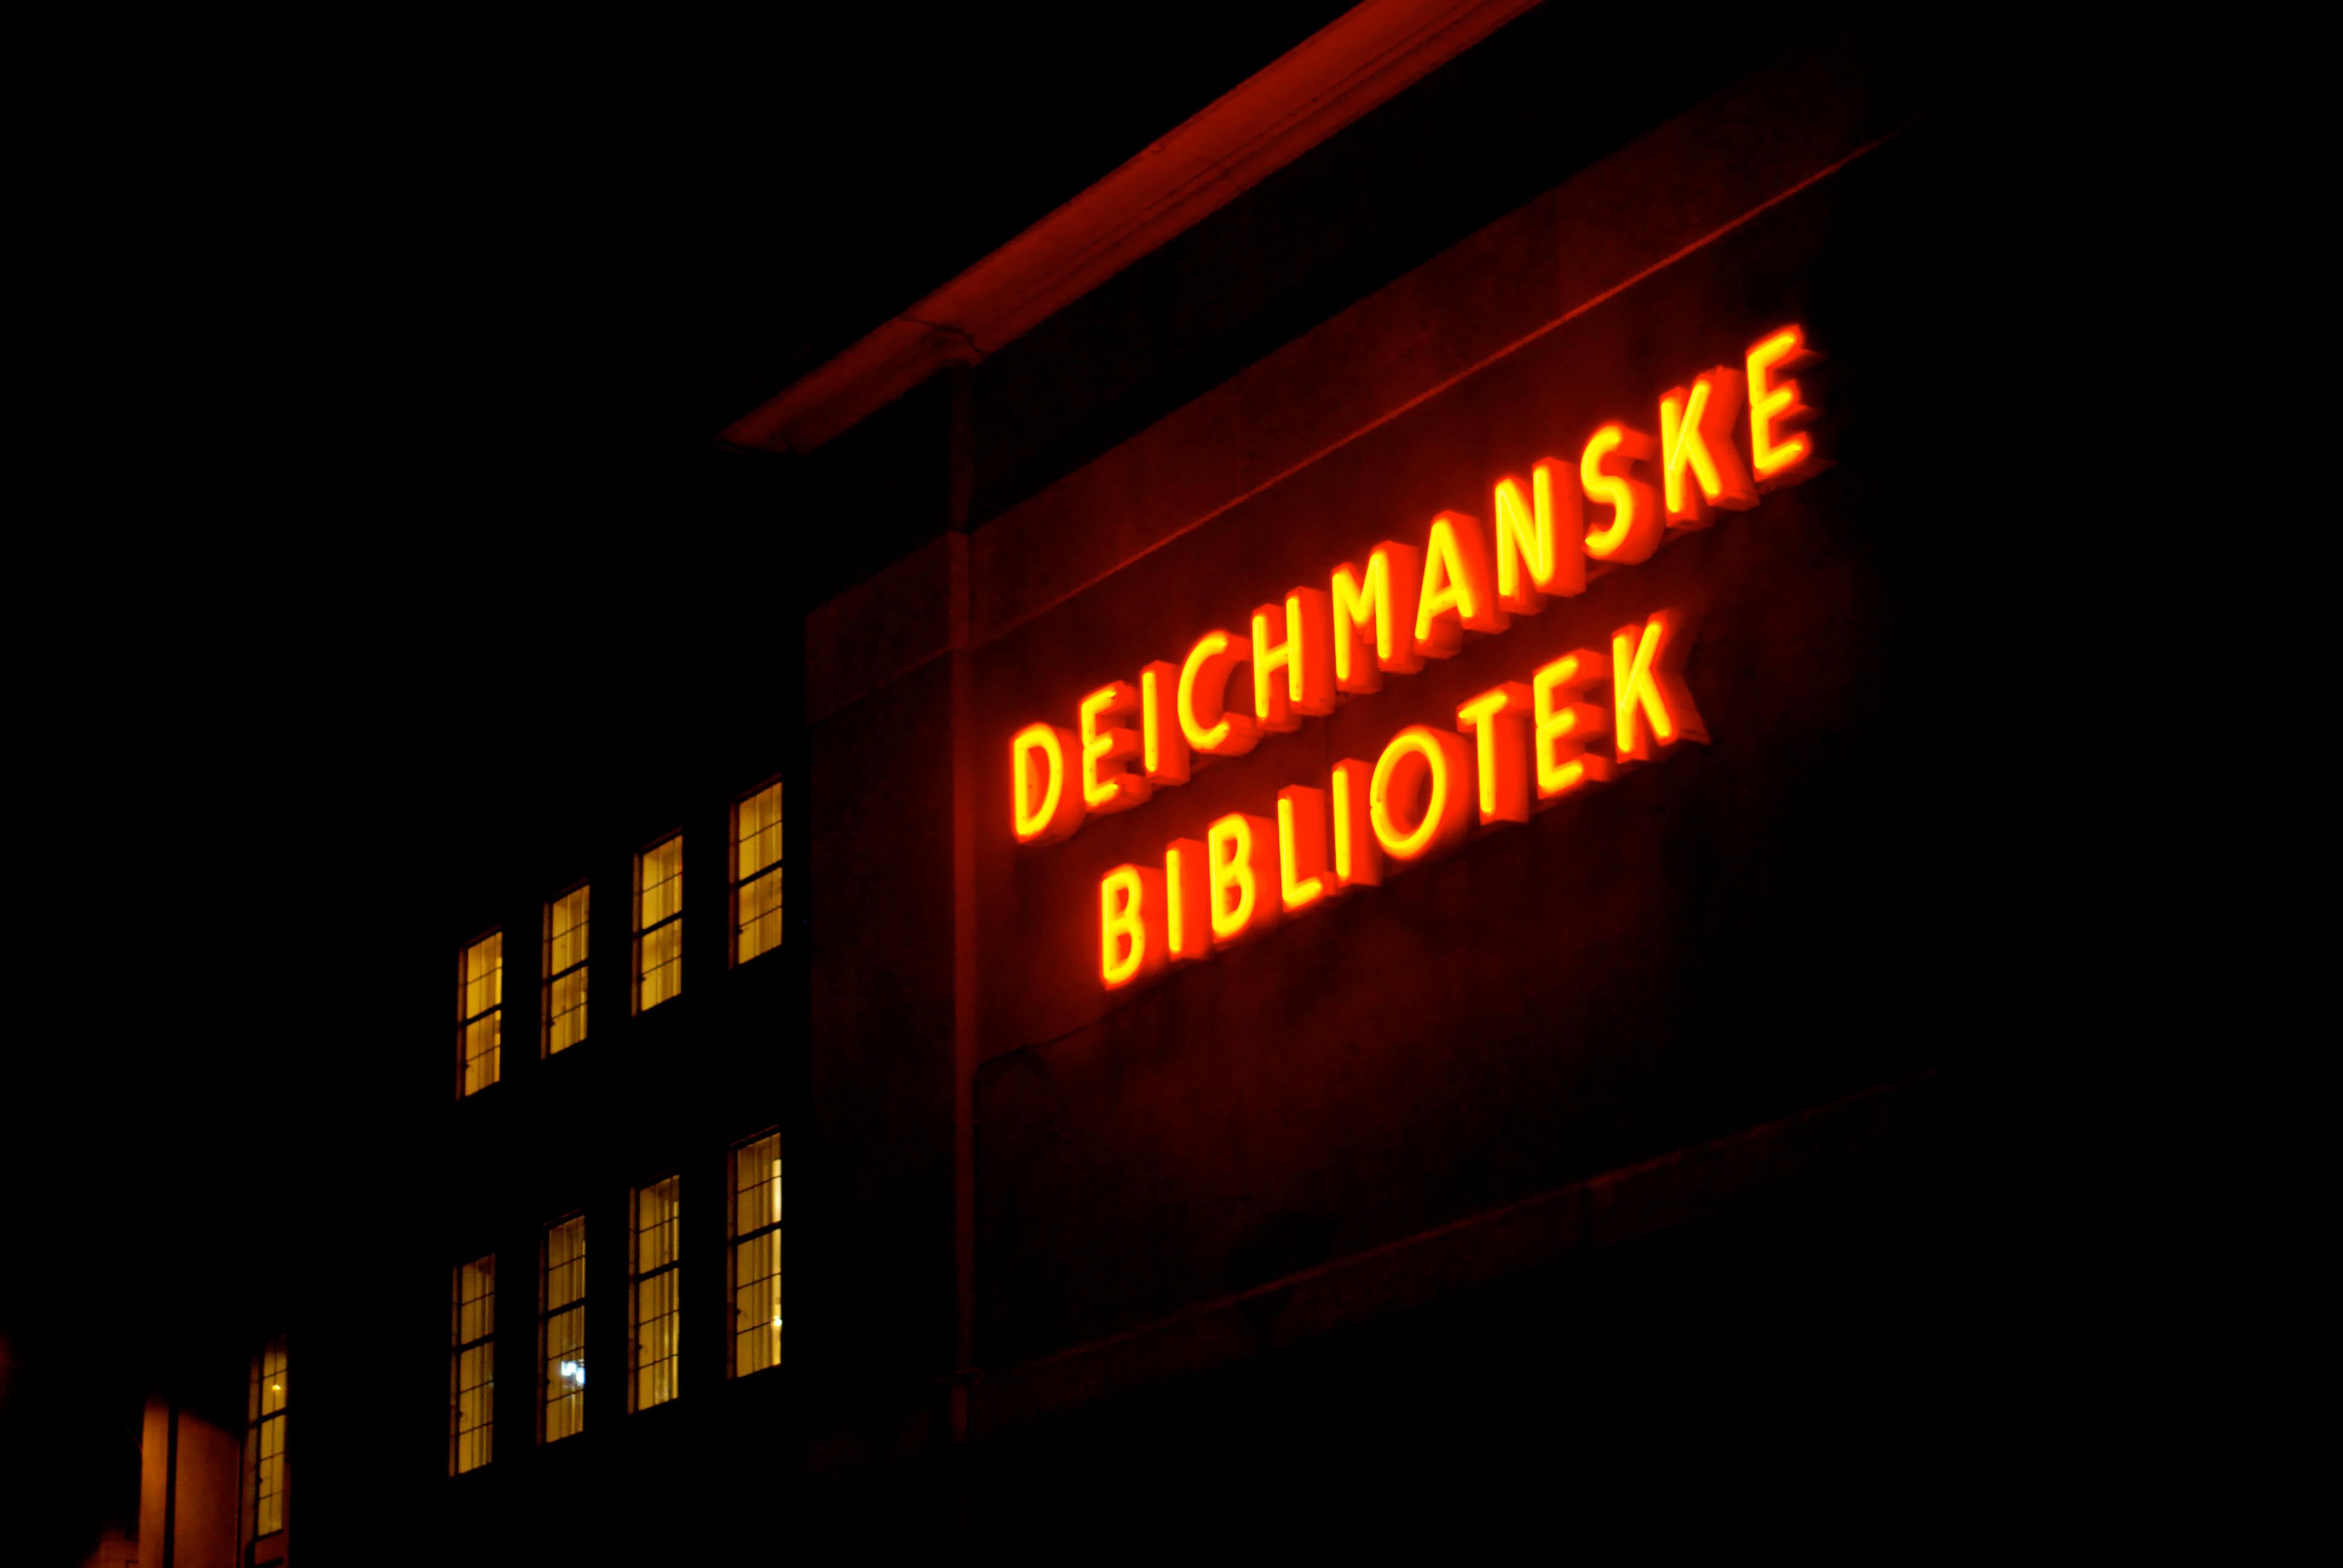 deichmanske bibliotek majorstuen